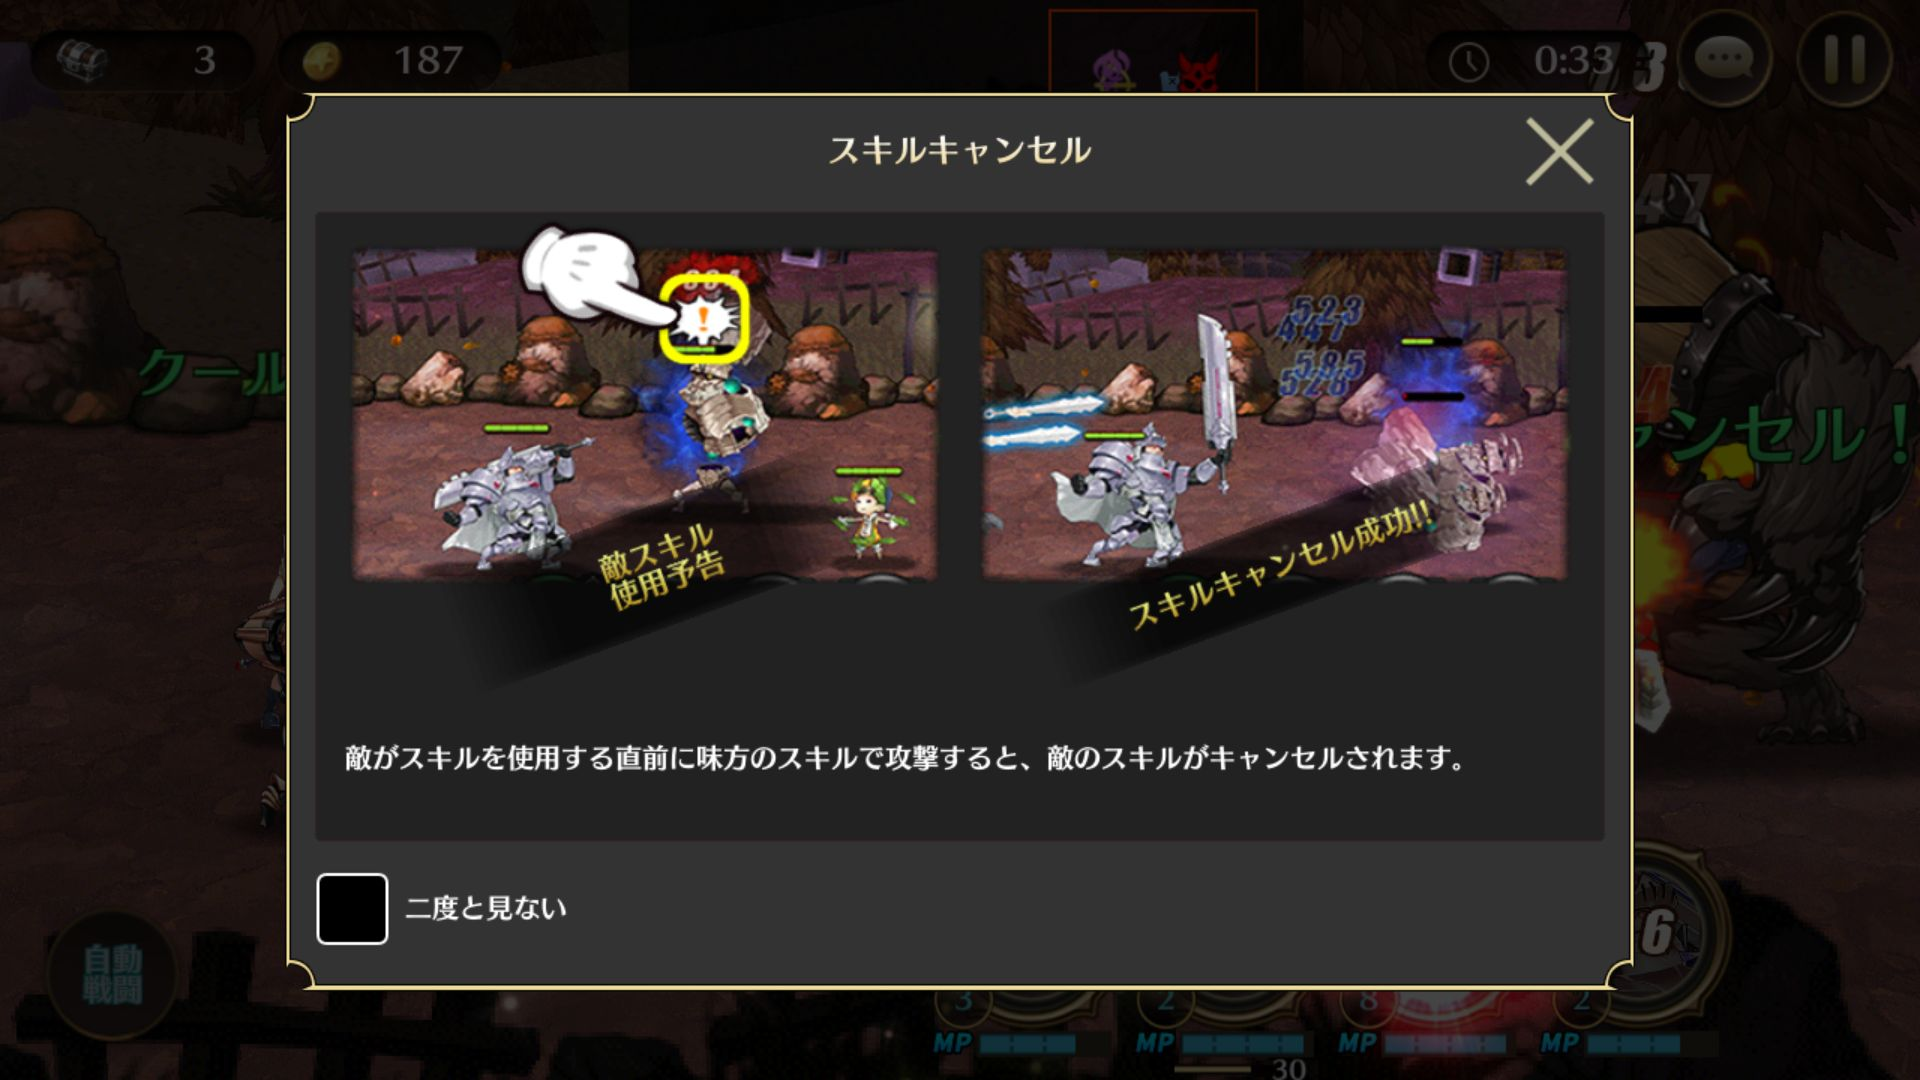 androidアプリ カオスクロニクル(Chaos Chronicle)攻略スクリーンショット3